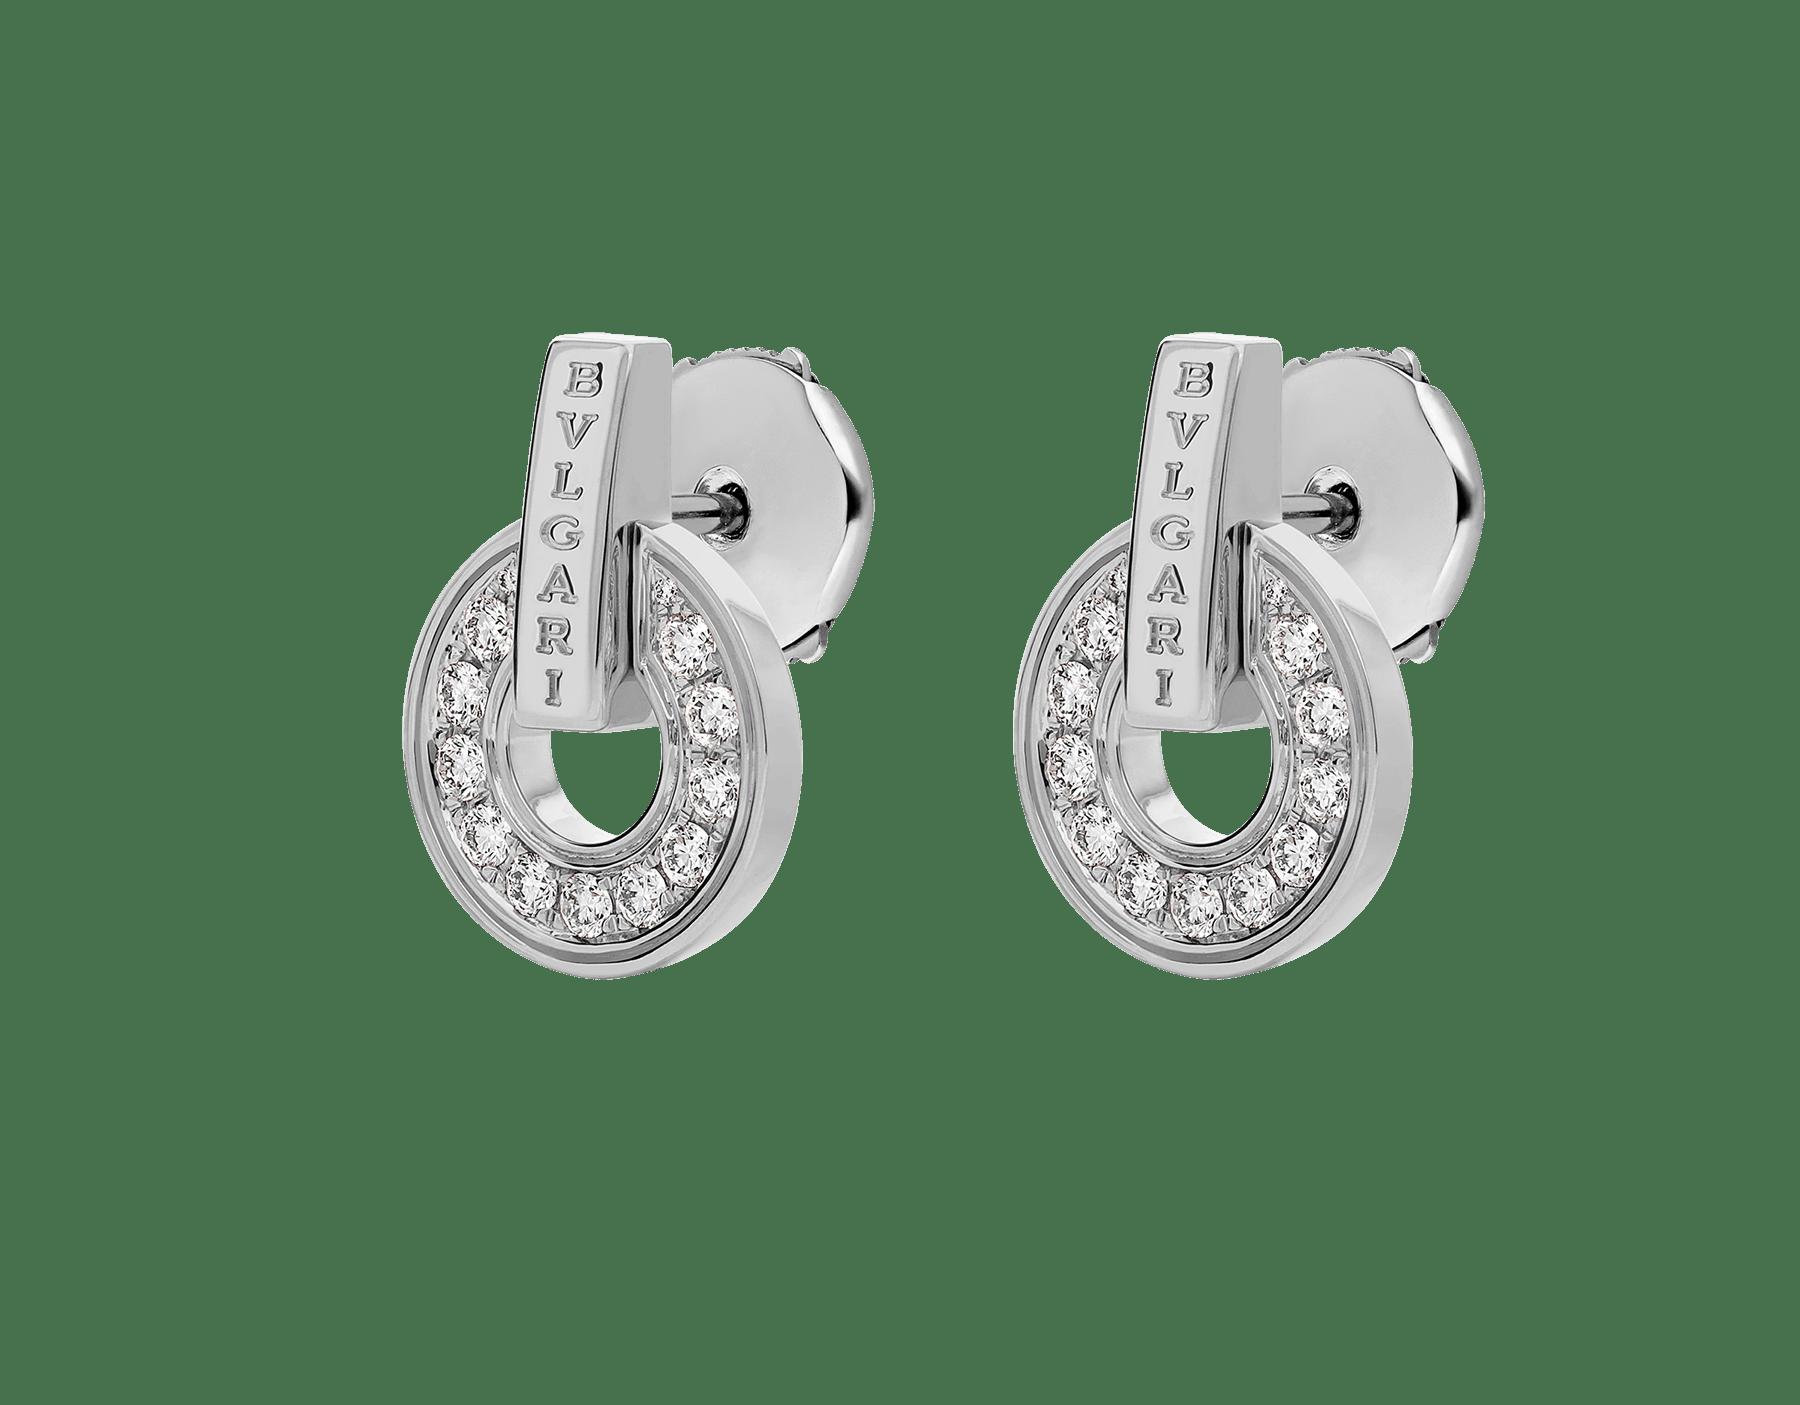 BVLGARI BVLGARI系列白色18K金镂空耳环,饰以全密镶钻石 357940 image 2